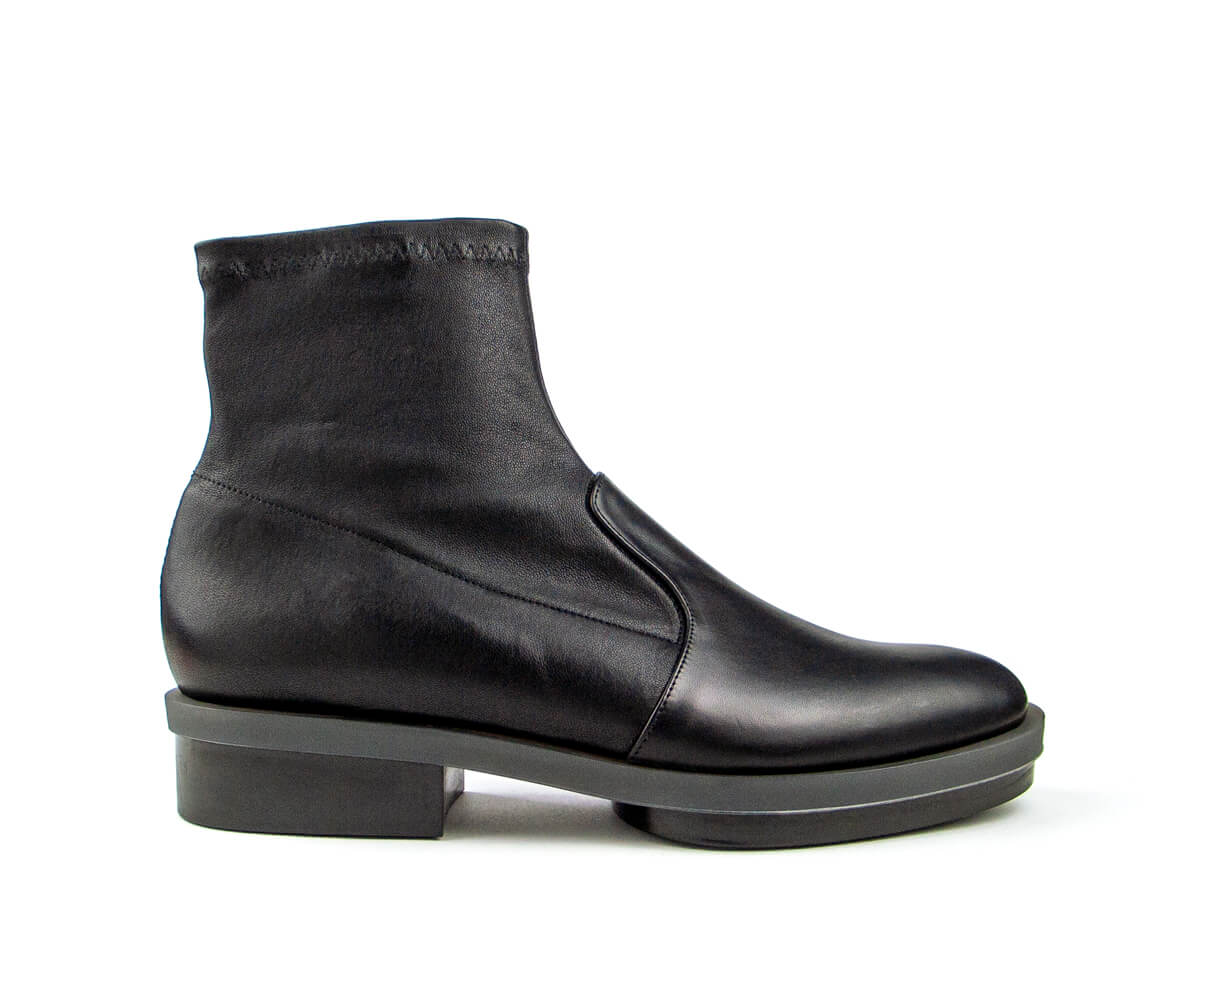 009 ecla scarpe rgb